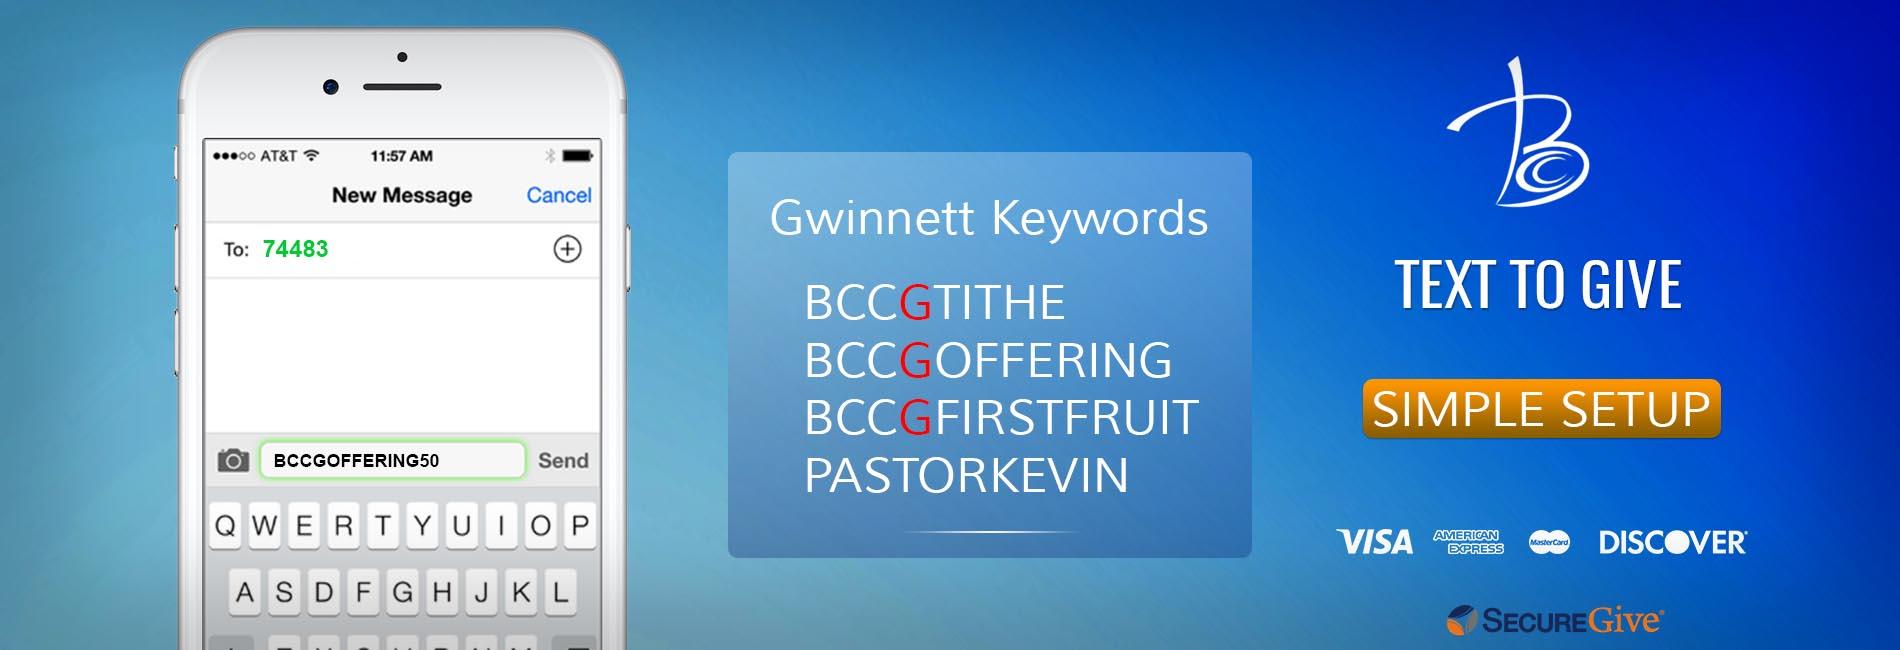 Berean Gwinnett Text to Give